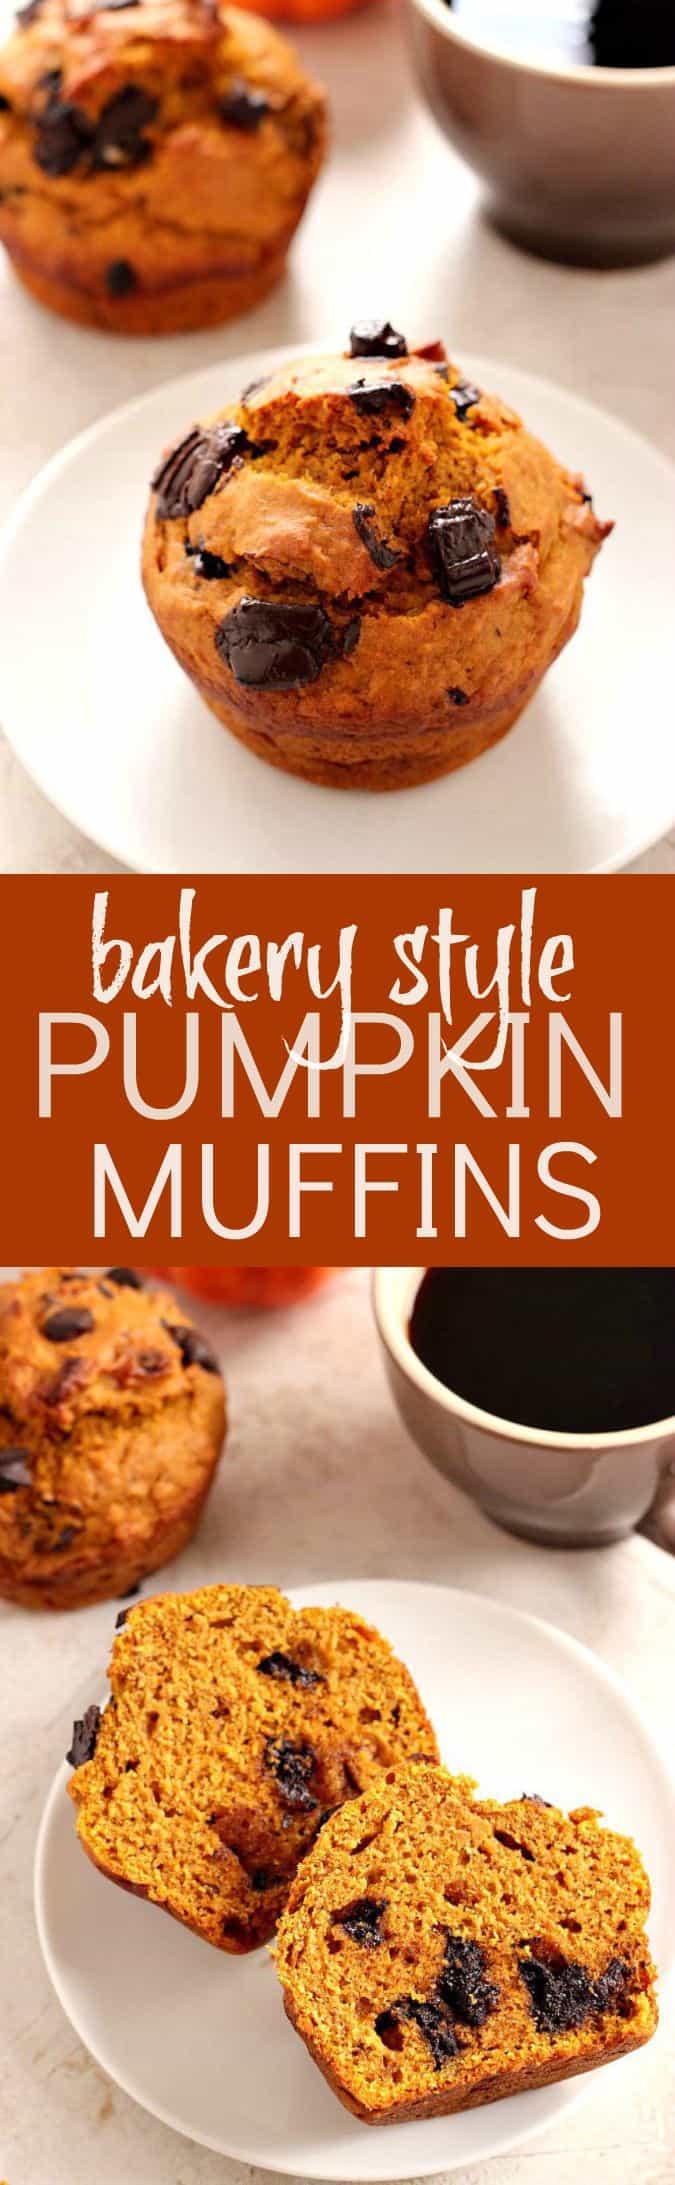 chocolate chunk pumpkin muffins long1 Bakery Style Chocolate Chunk Pumpkin Muffins